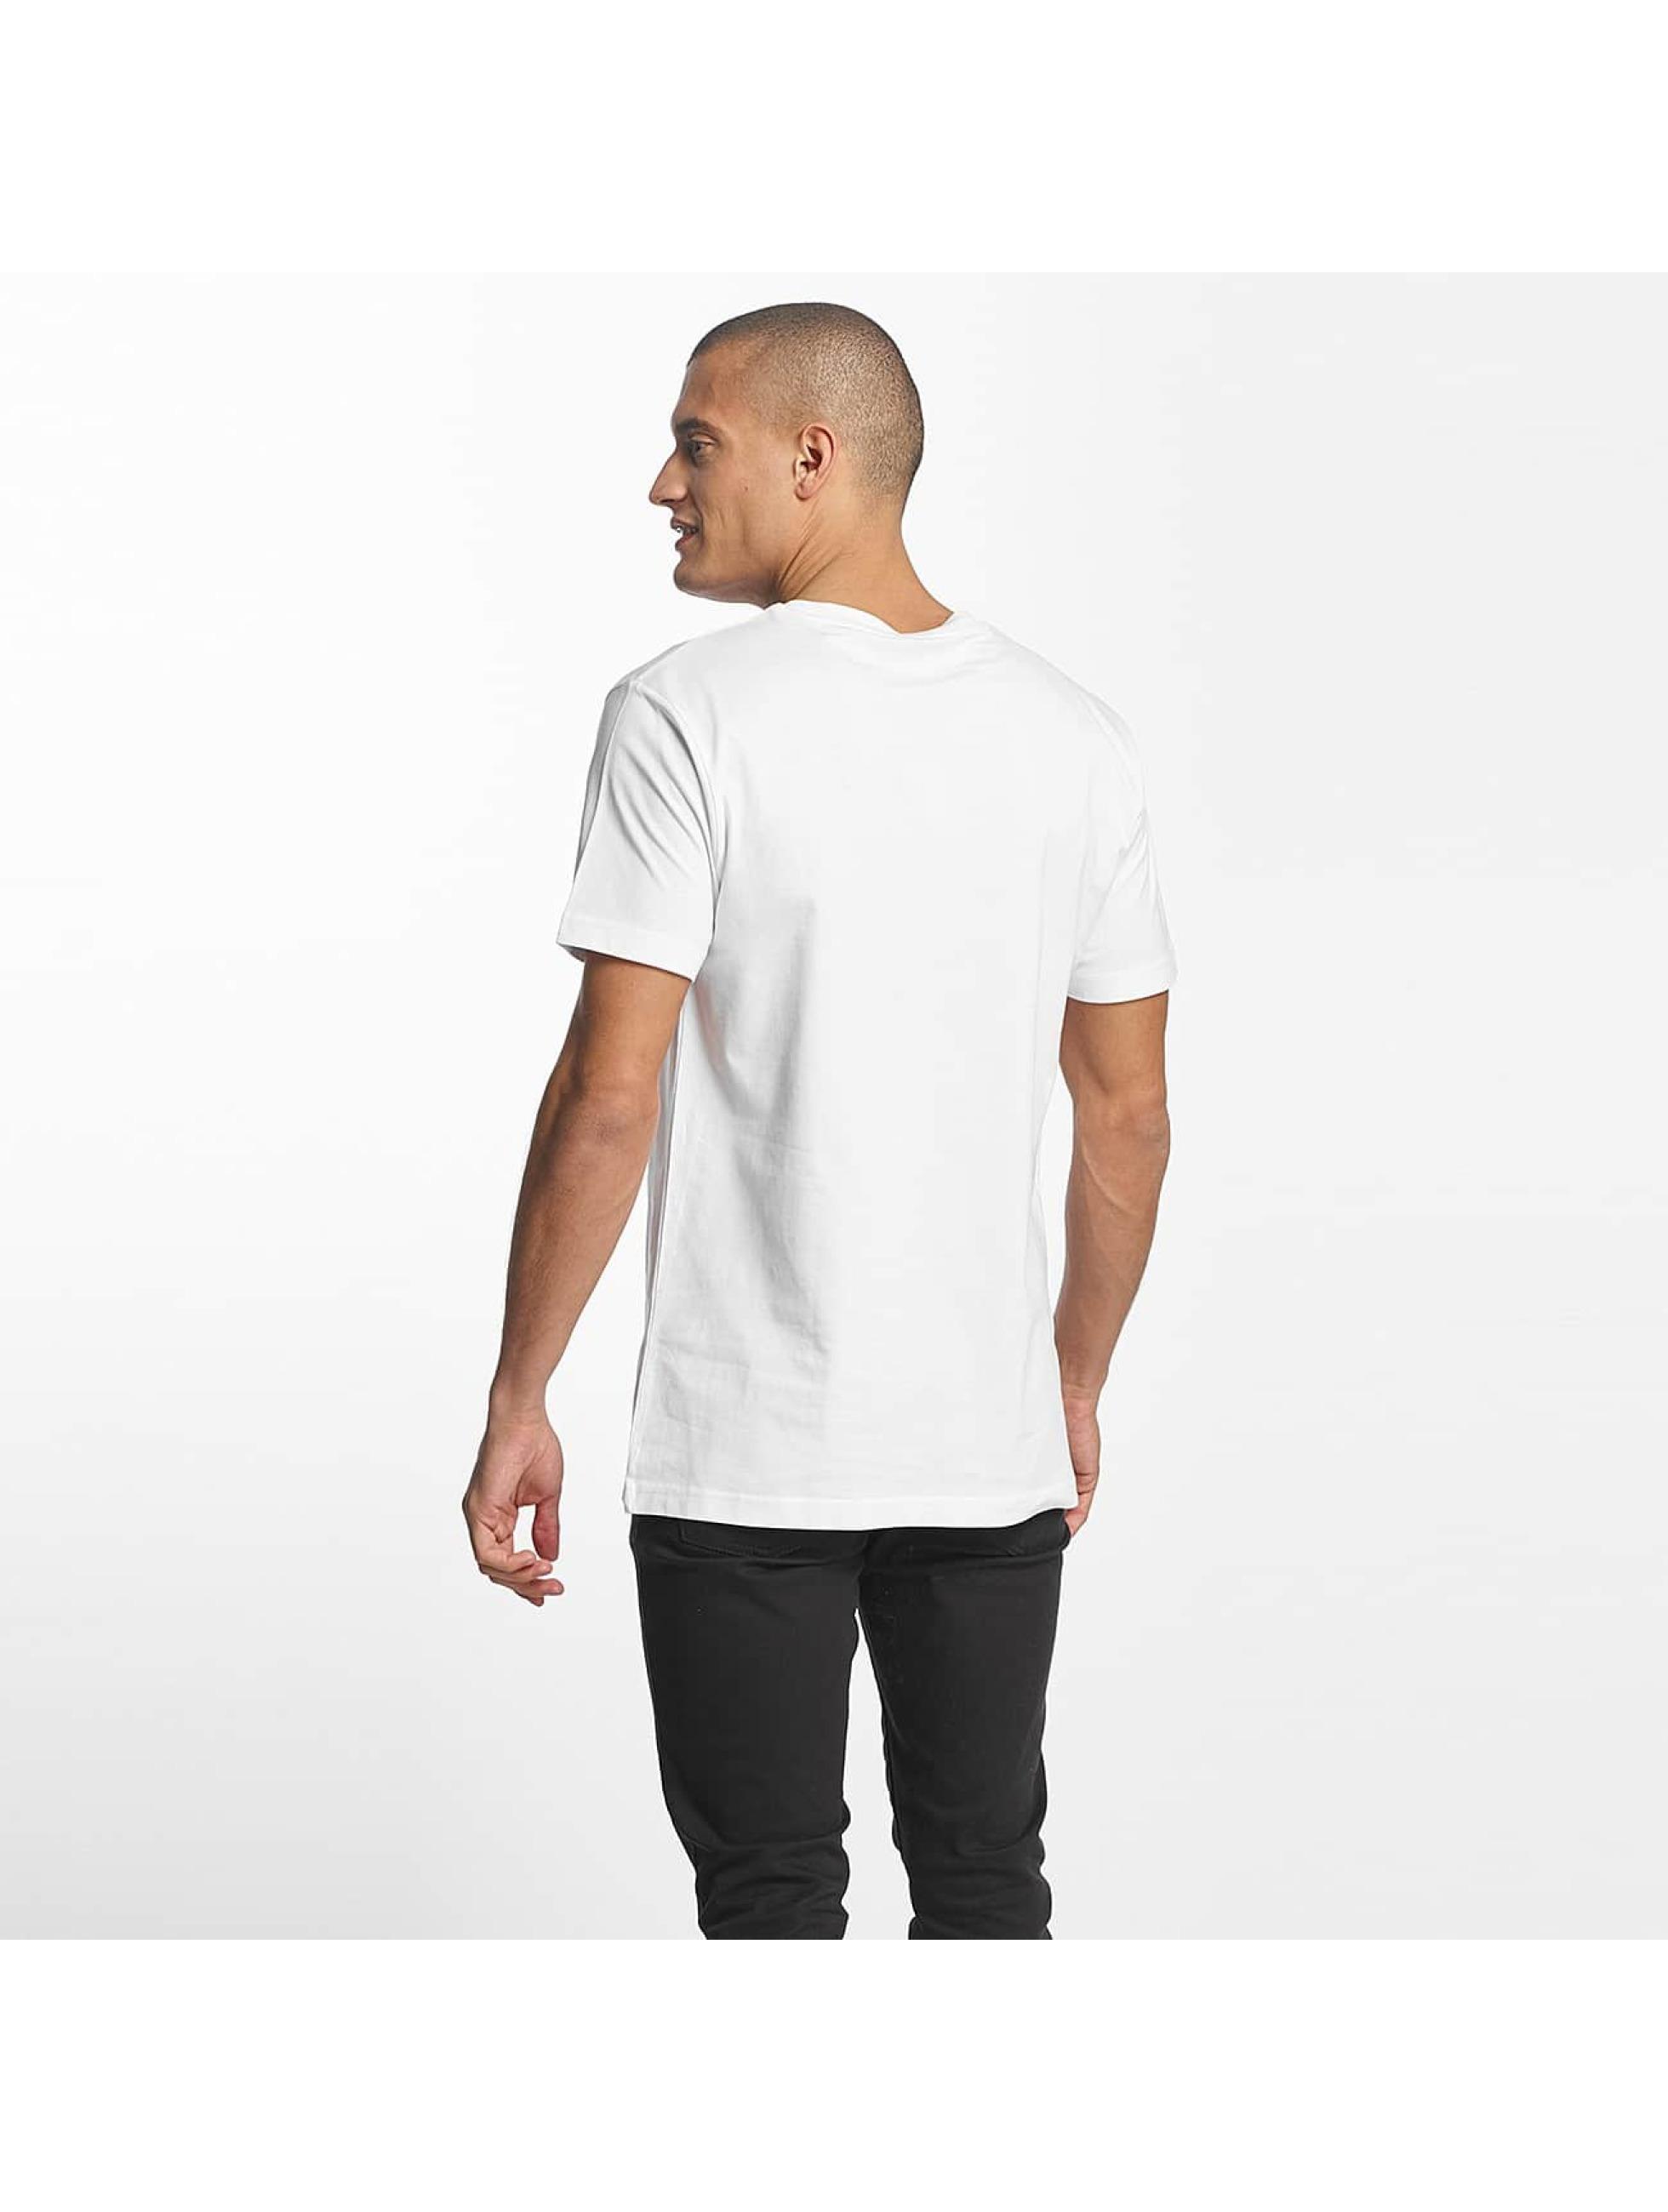 Mister Tee T-shirt Gangstas of Paradise bianco